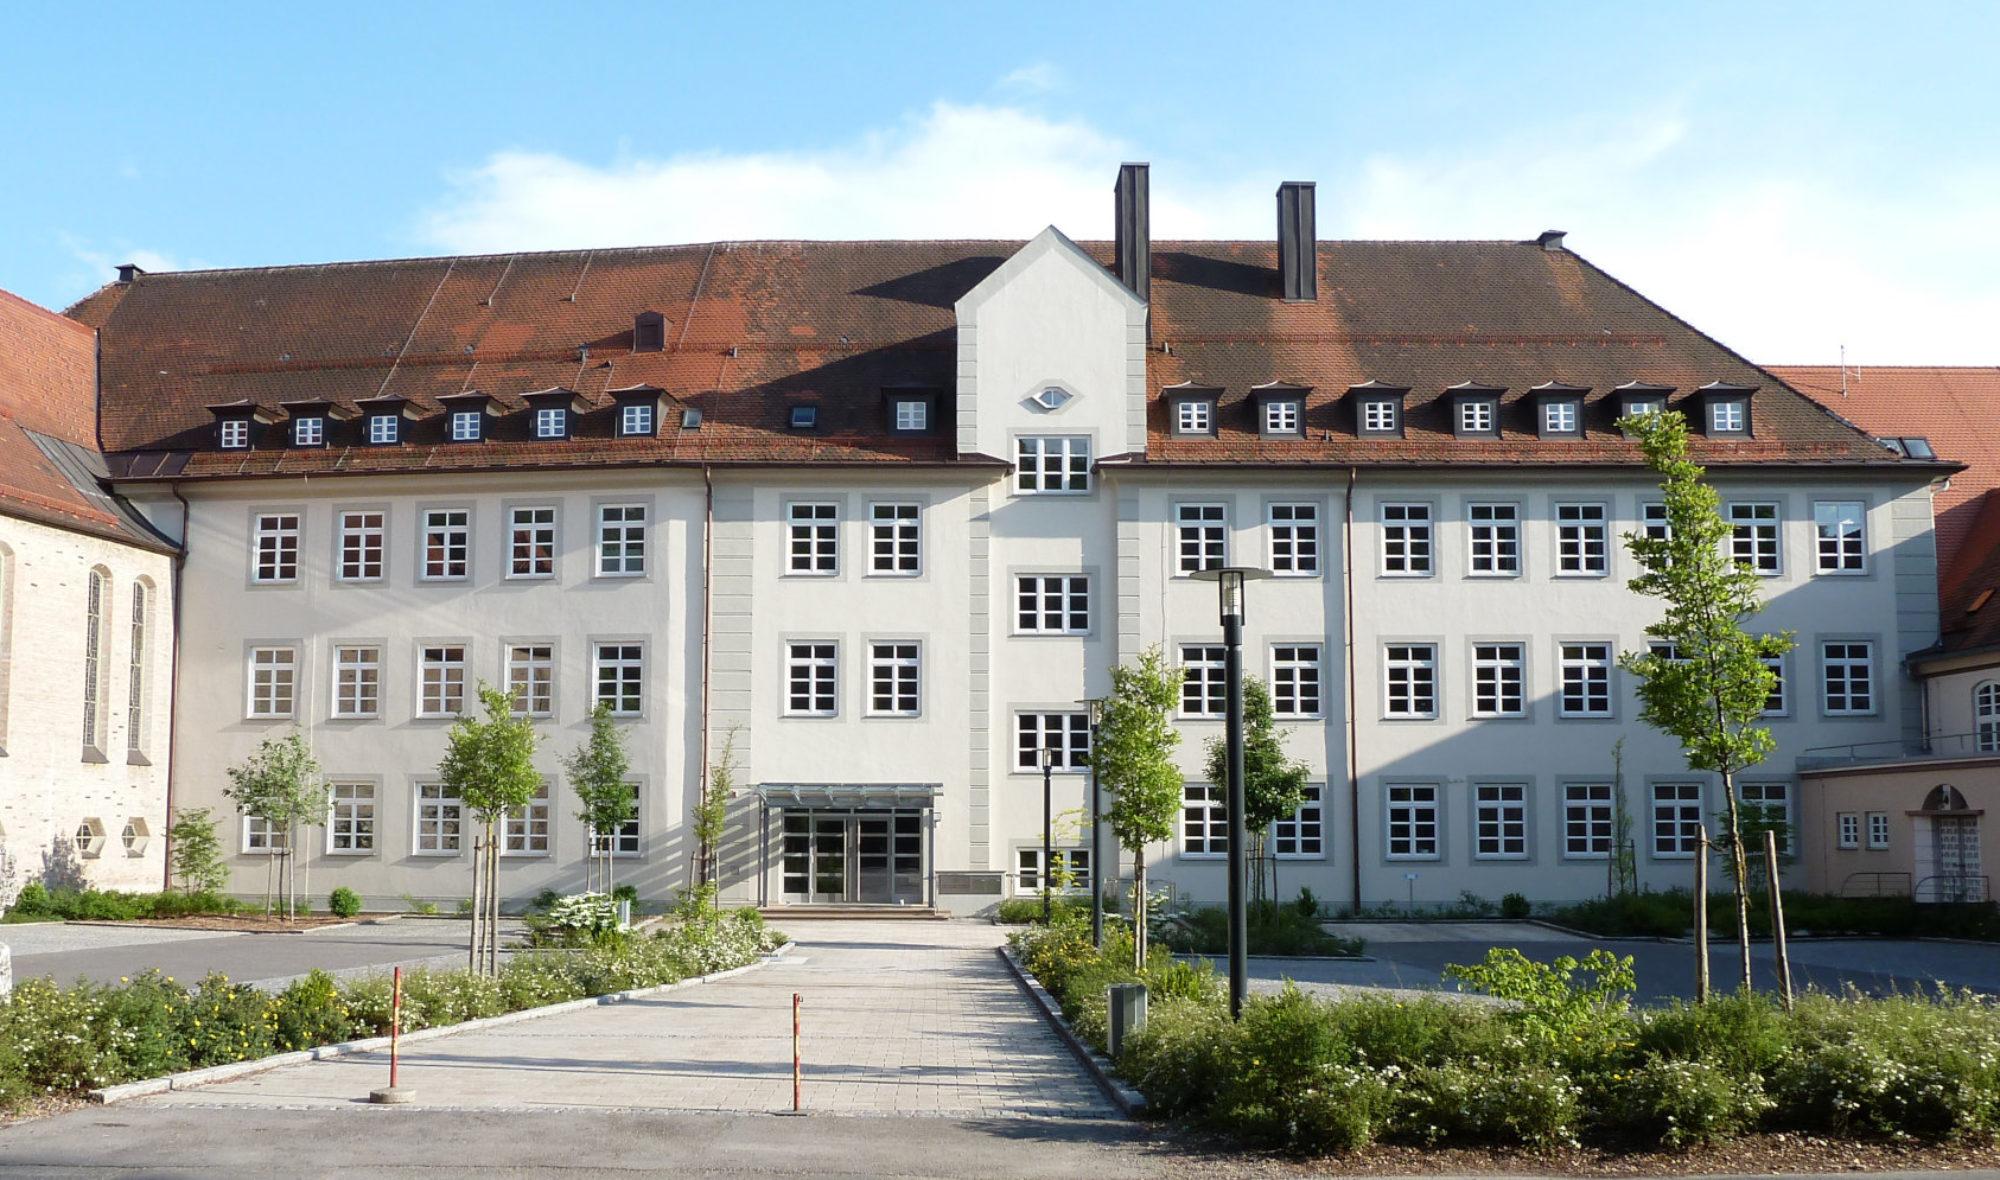 Förderverein des Marien-Gymnasiums Kaufbeuren e.V.